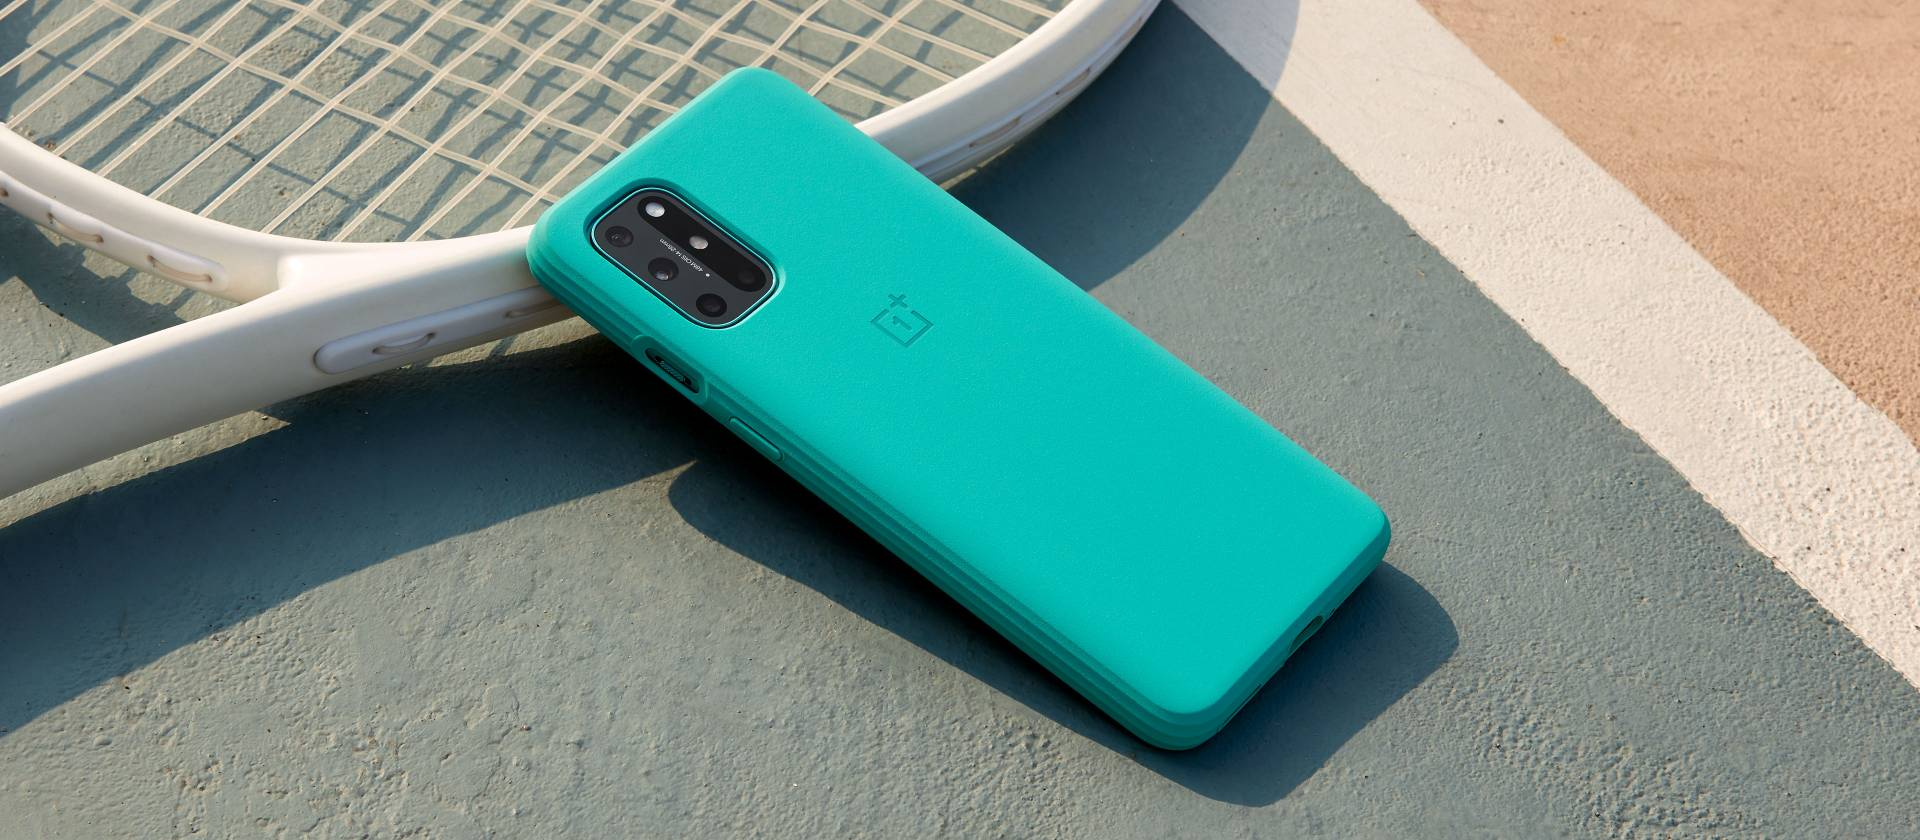 OnePlus_8T_Sandstone_Bumper_Case-03.jpg